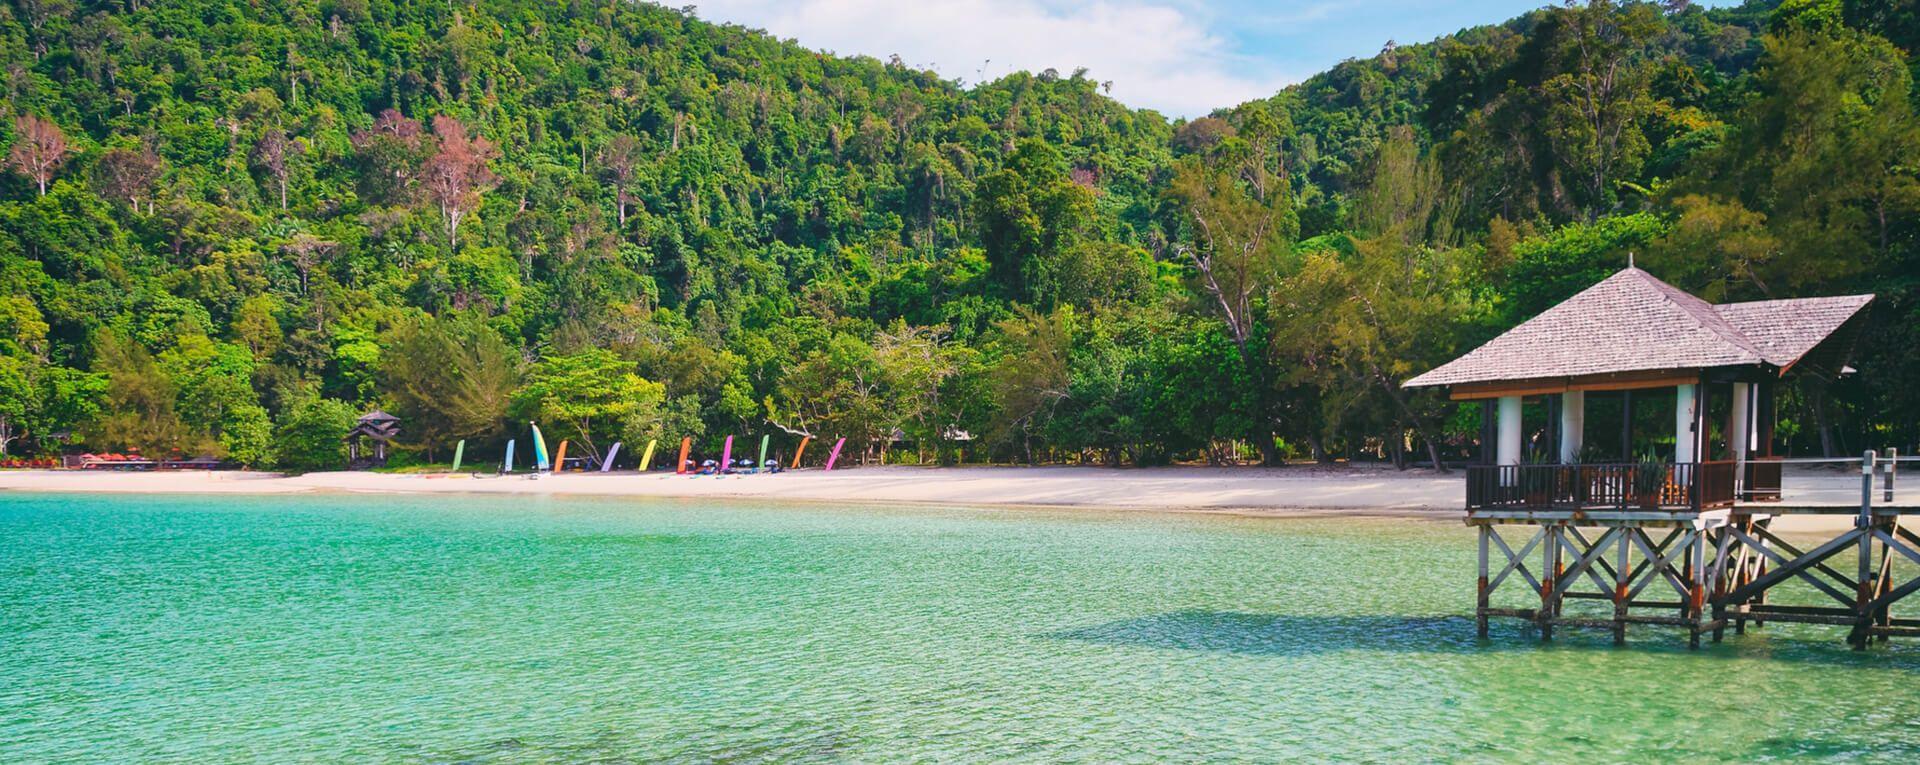 Bungaraya Island Resort & Spa, Malaysia